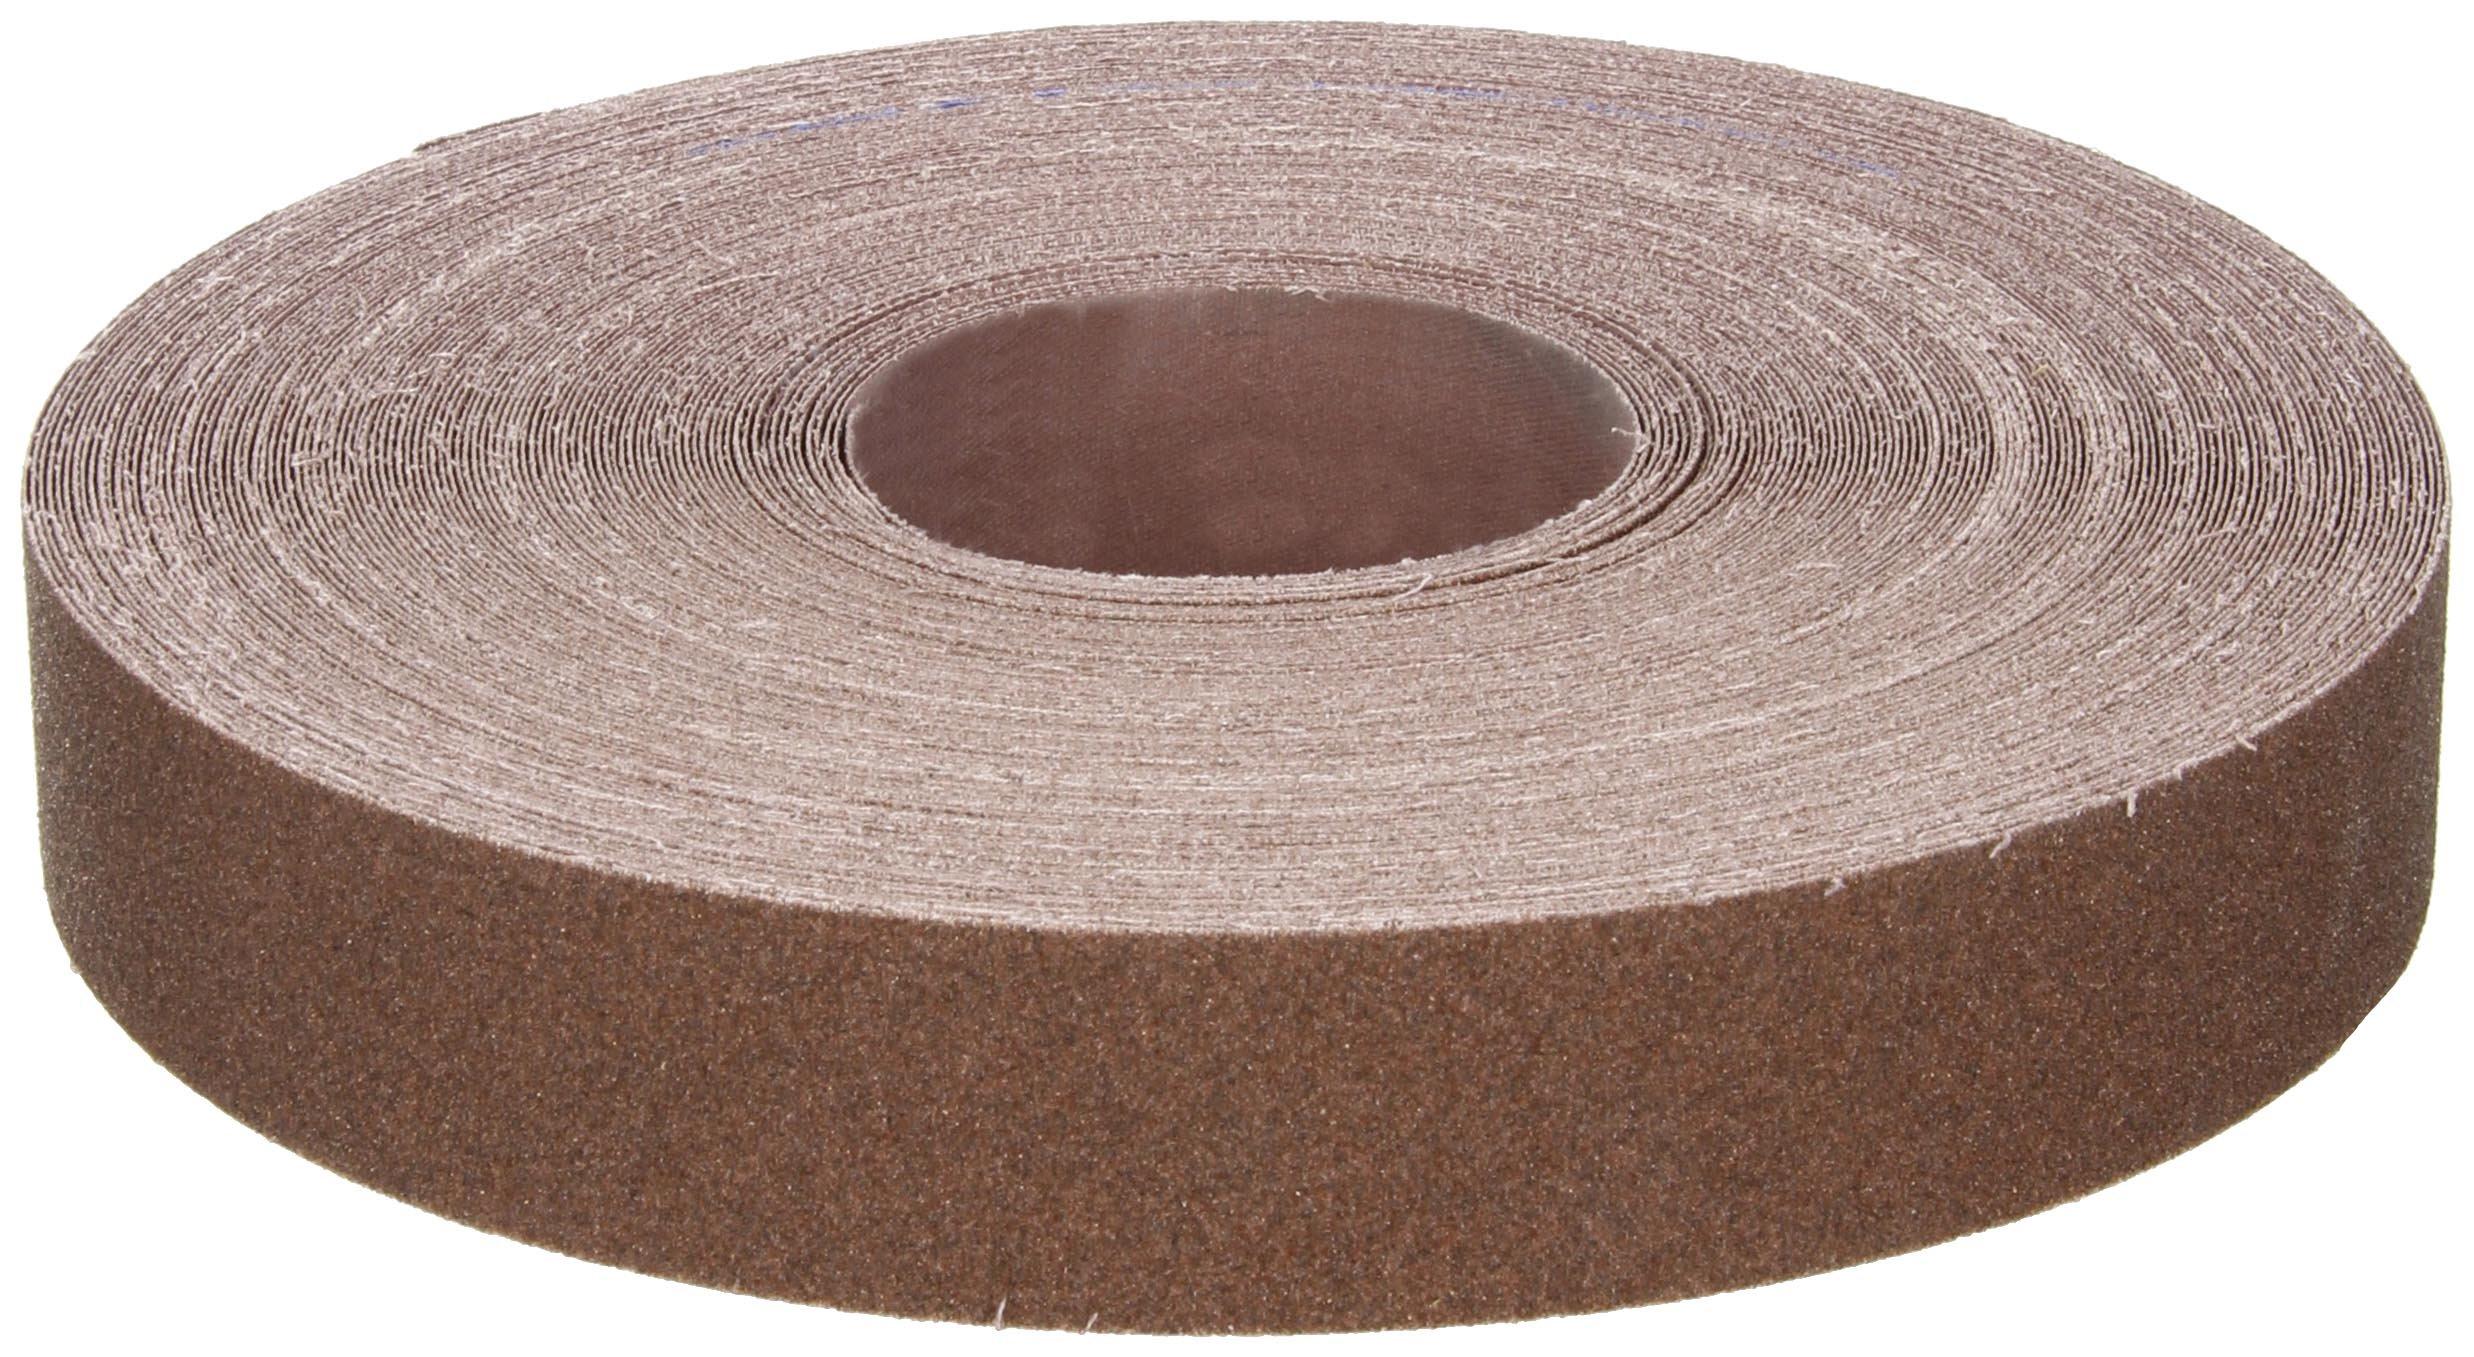 Norton K225 Metalite Abrasive Roll, Cloth Backing, Aluminum Oxide, 1-1/2'' Width x 50yd Length, Grit P80 by Norton Abrasives - St. Gobain